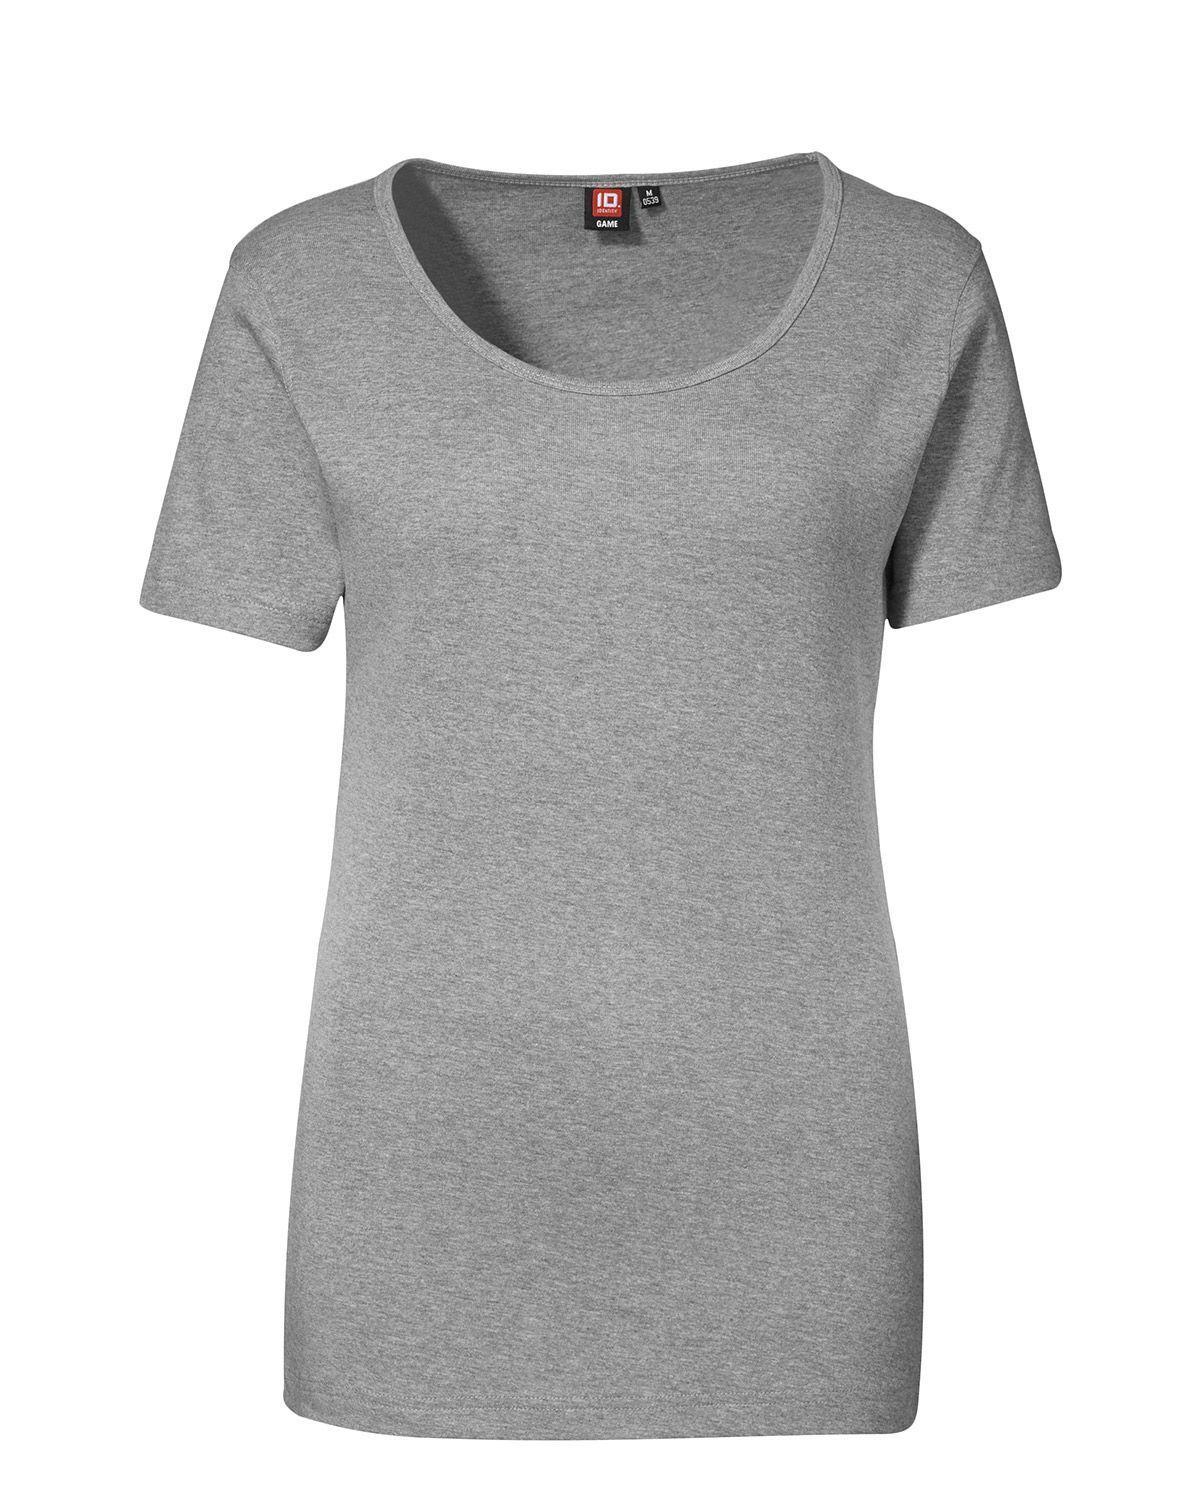 ID 1x1 rib T-shirt til Kvinder (Grå Meleret, 2XL)